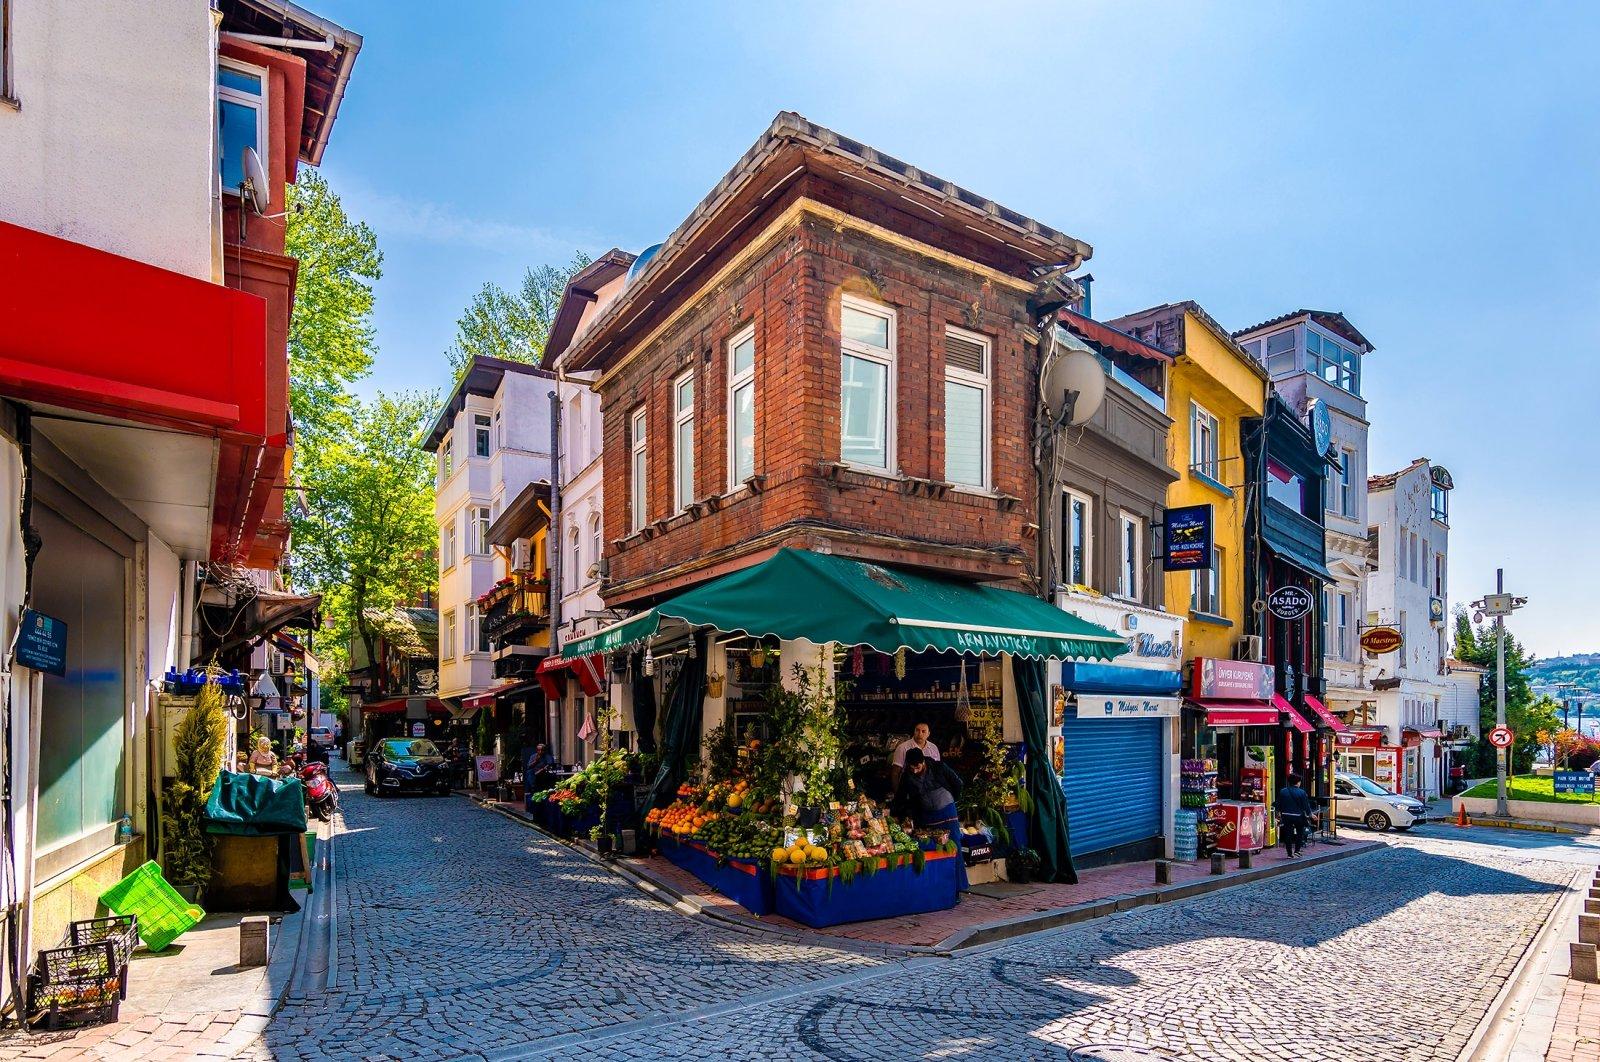 A view of Arnavutköy street in Istanbul, Turkey. (Shutterstock Photo)